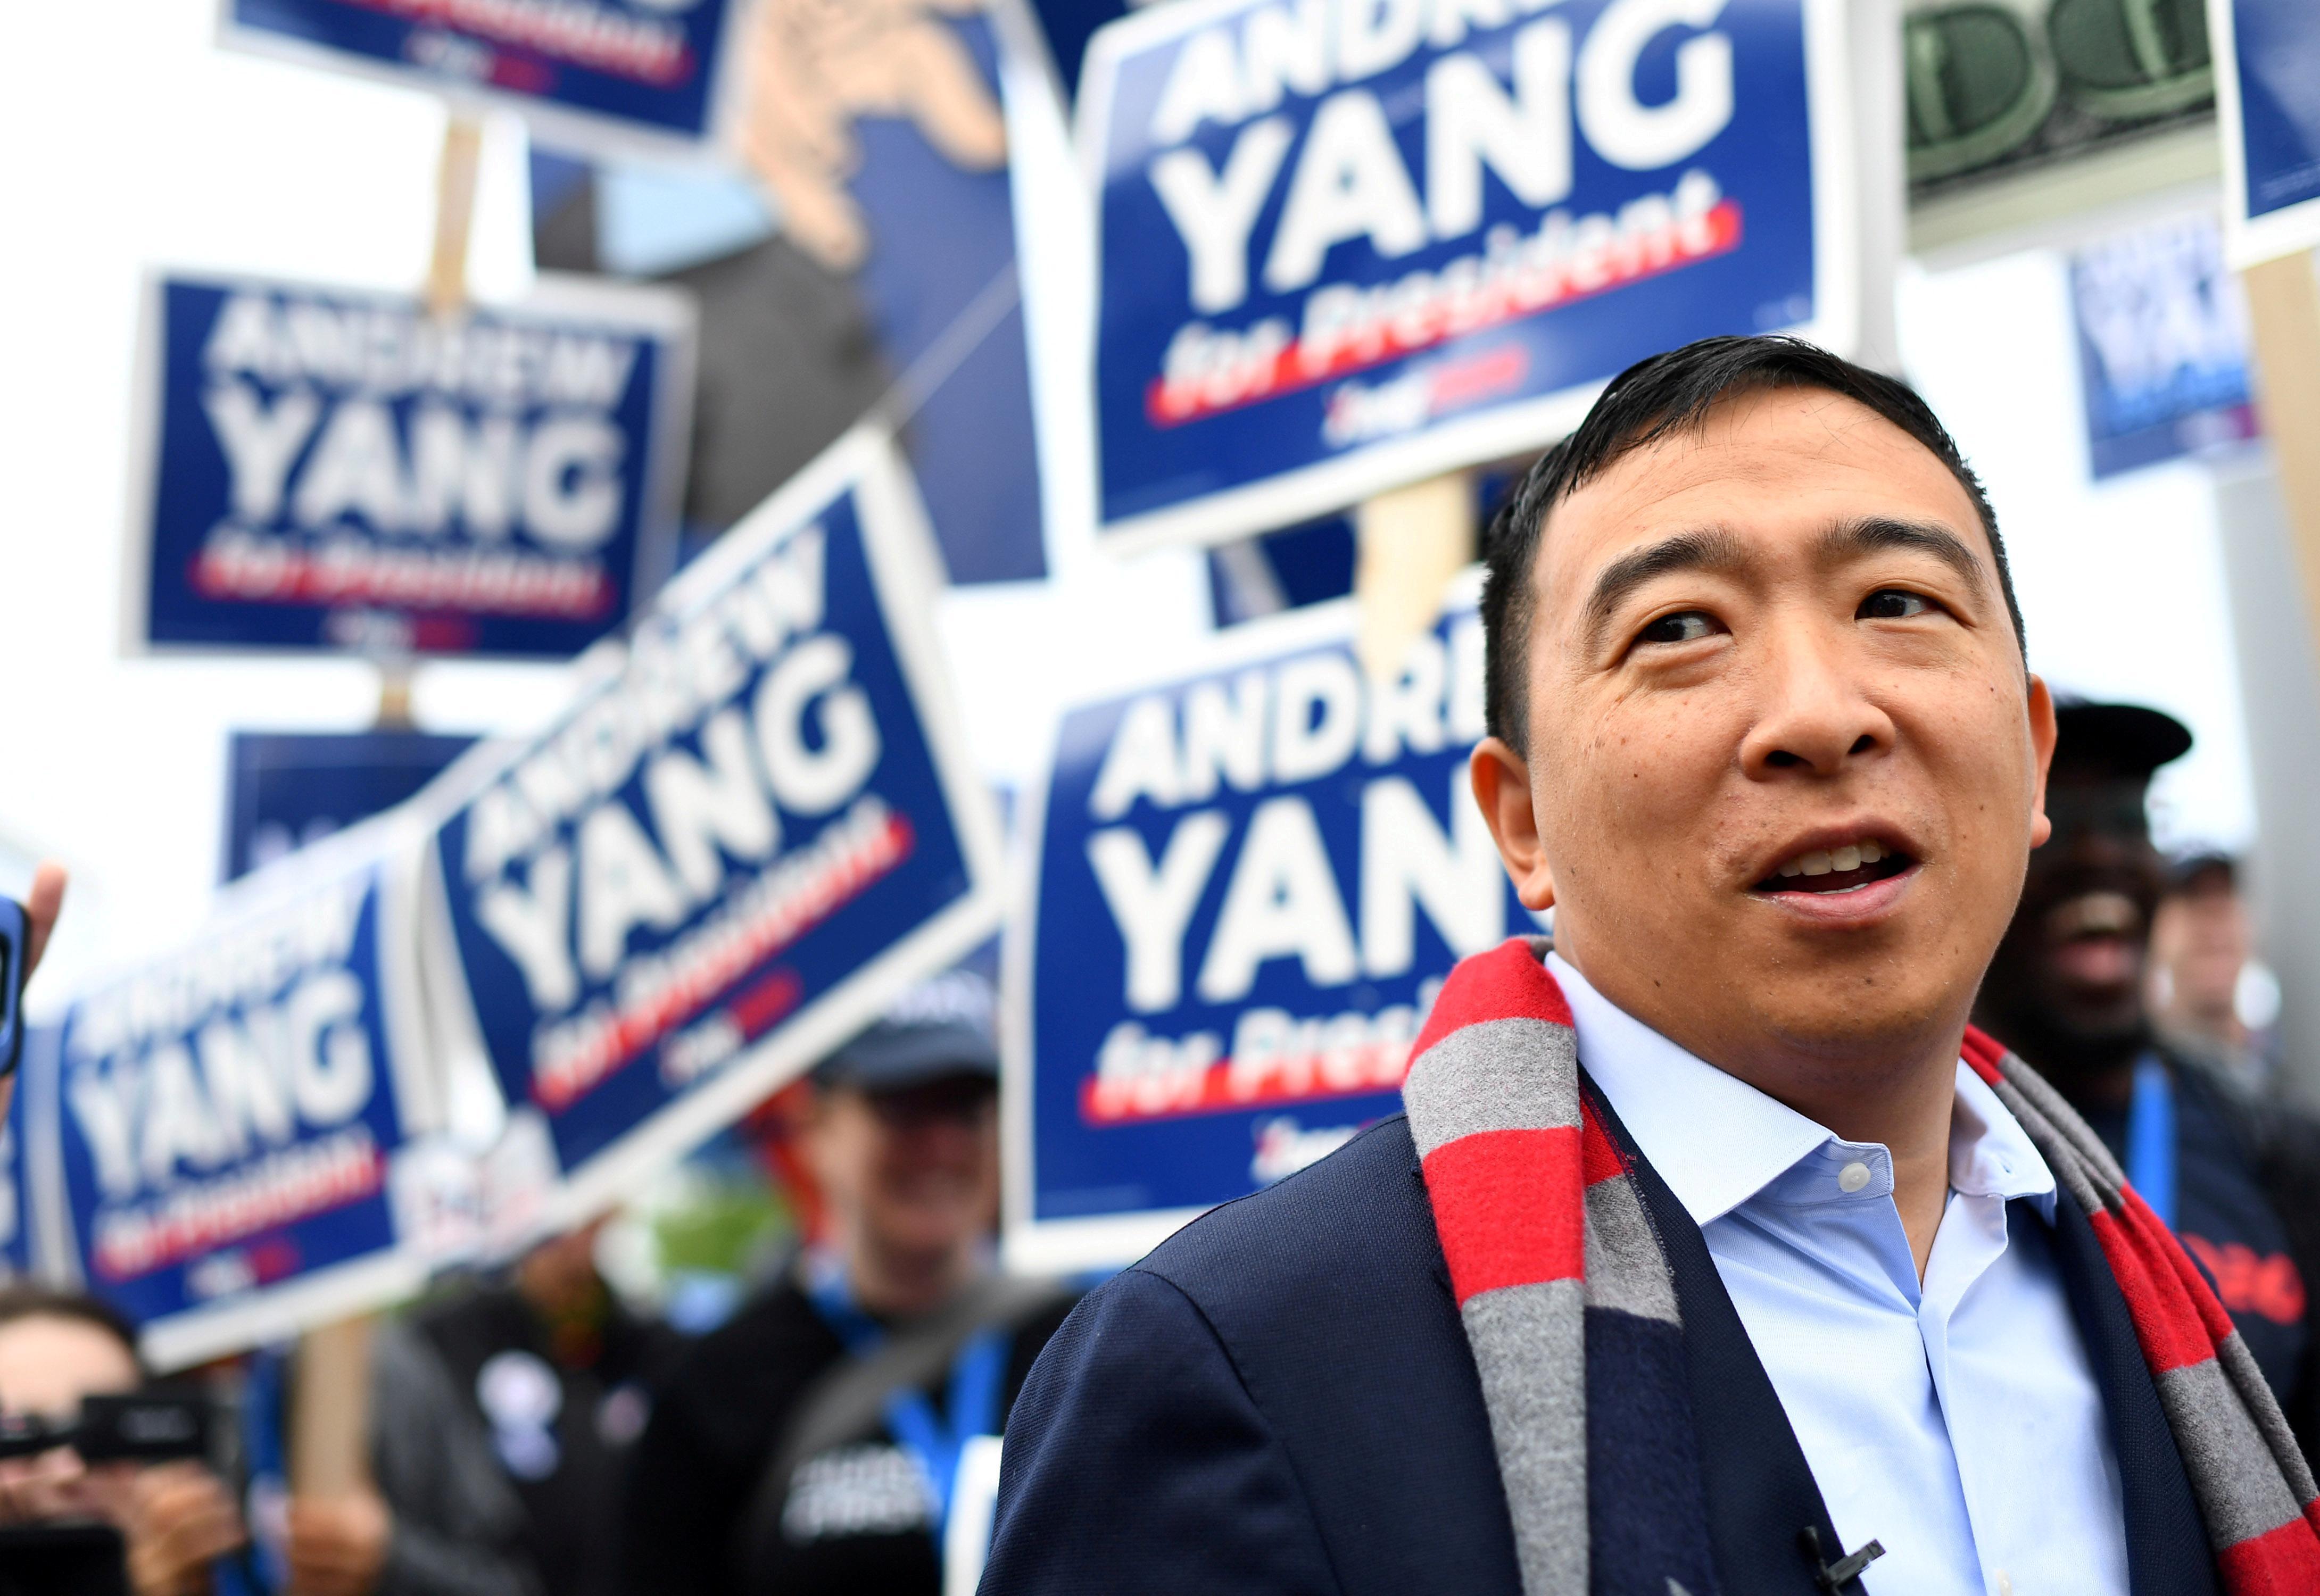 Entrepreneur Andrew Yang's quixotic U.S. presidential campaign gets...